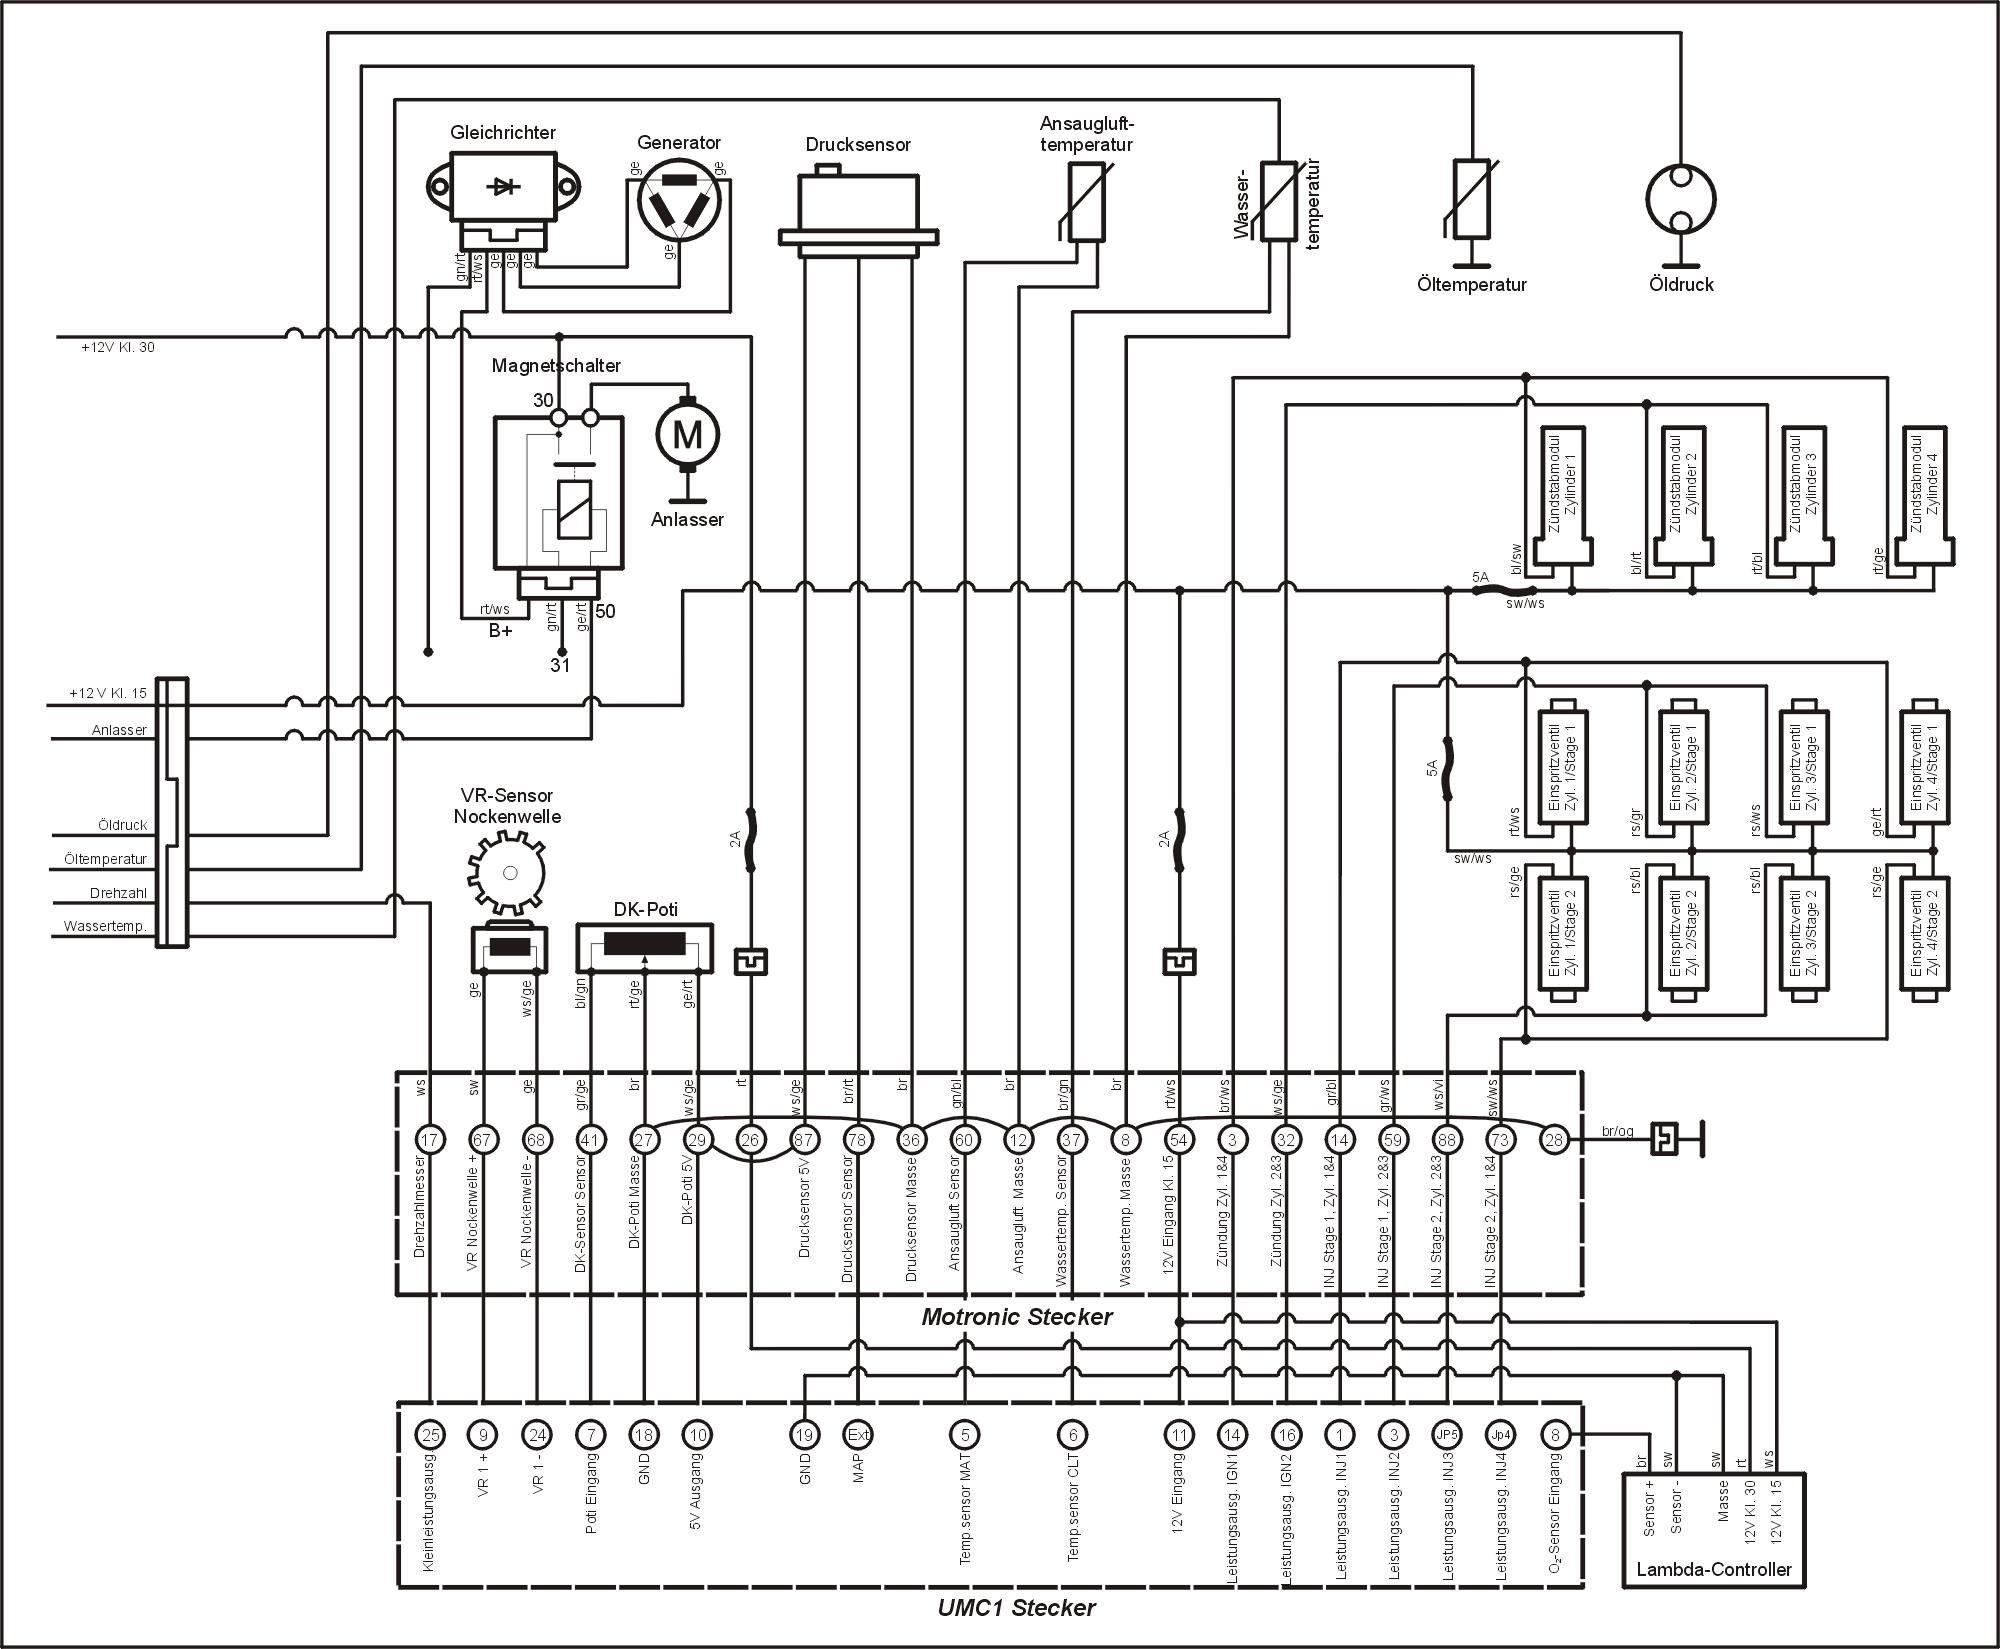 Großzügig Original Schaltplan Bilder - Schaltplan Serie Circuit ...